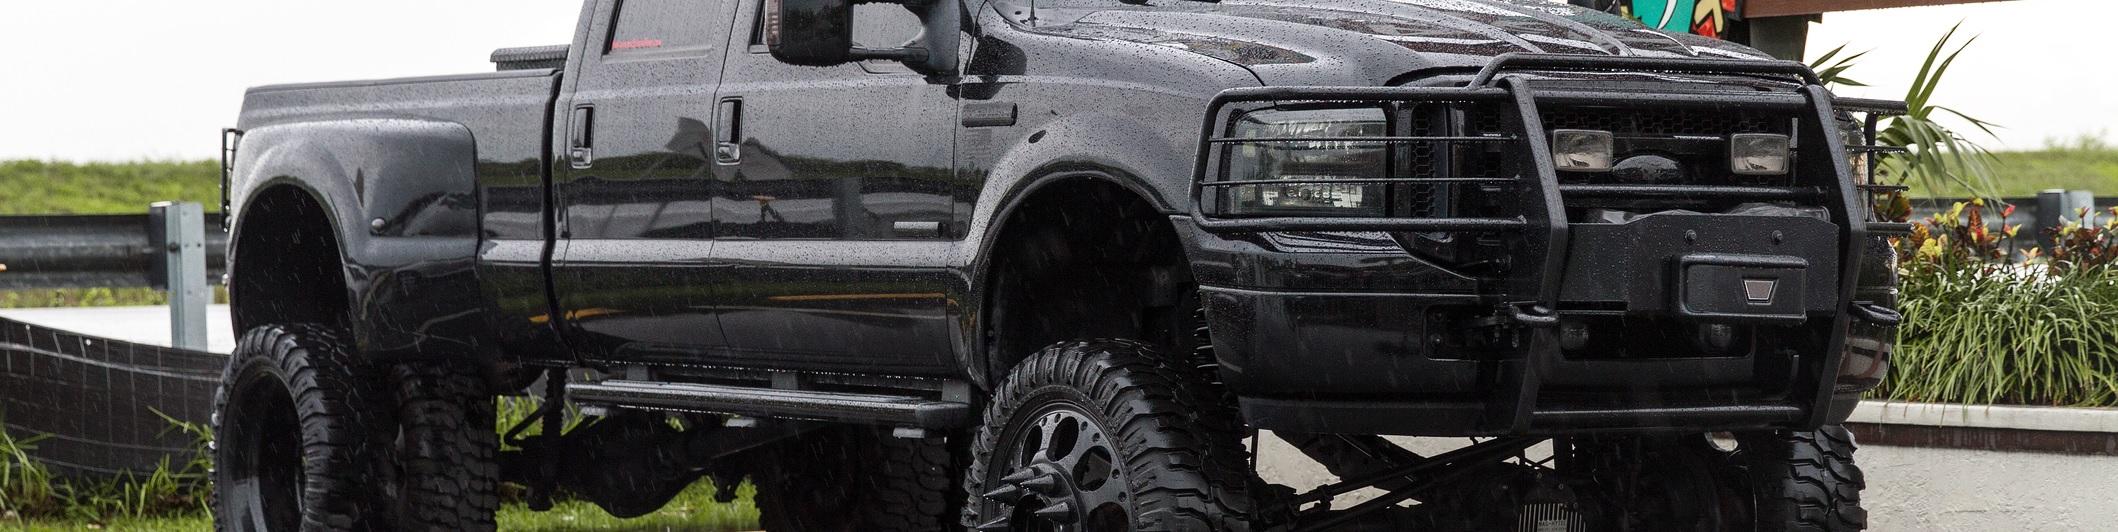 Diesel Trucks For Sale Near Me >> Diesel Trucks For Sale Ewald Automotive Group